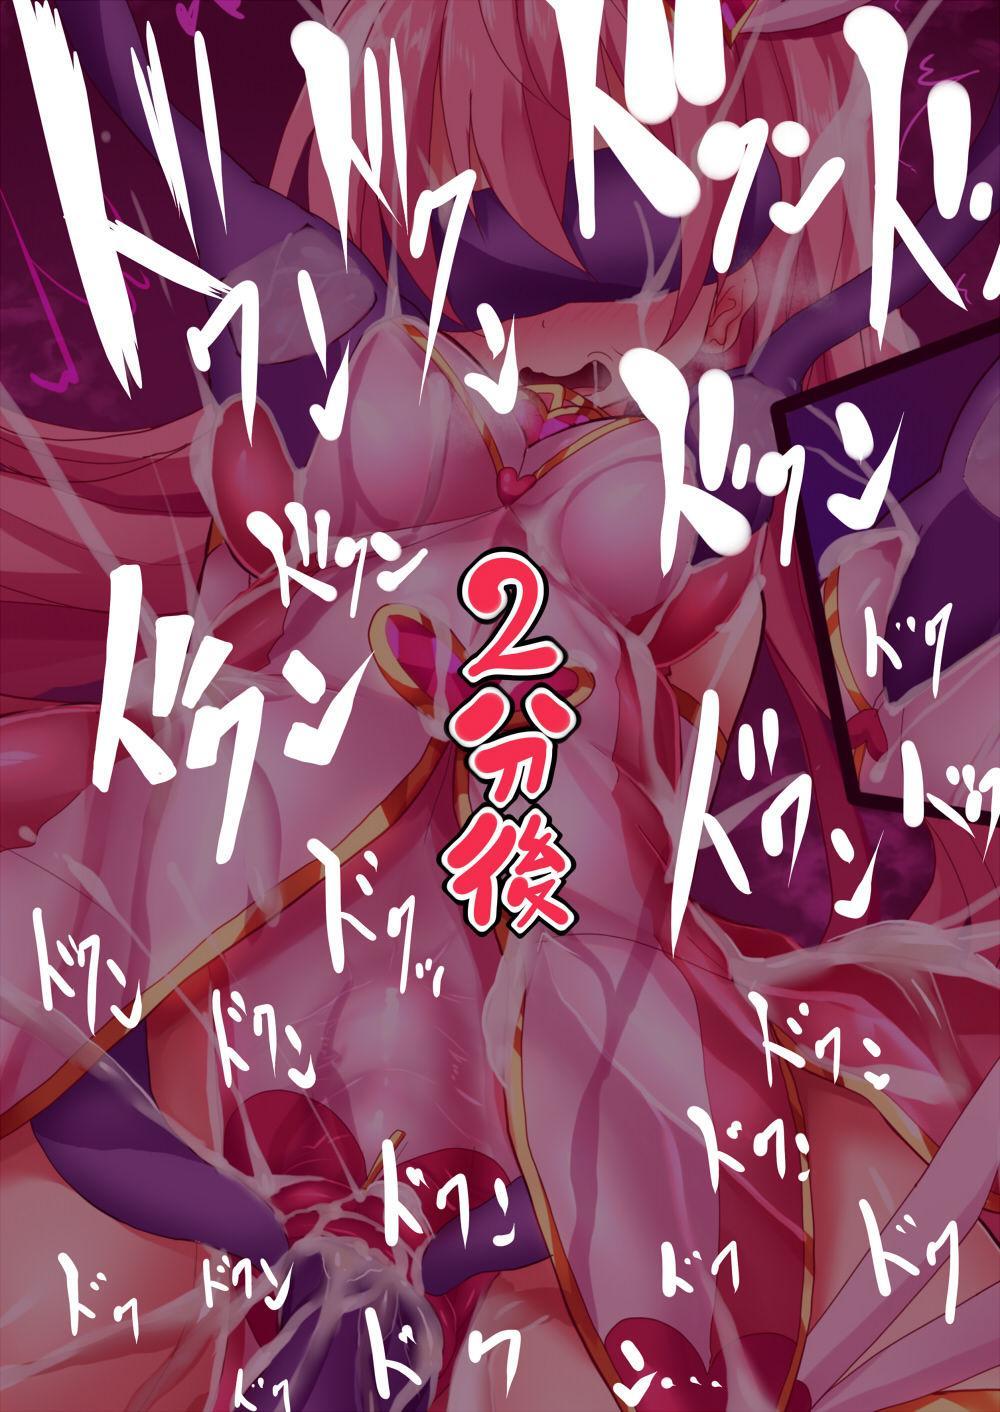 [Makutsutei (Nagai Wataru)] Orgasm Unit EX -Mahou Senshi Akari Ch. 1-2 [Chinese] [这很恶堕 x Lolipoi汉化组] 30